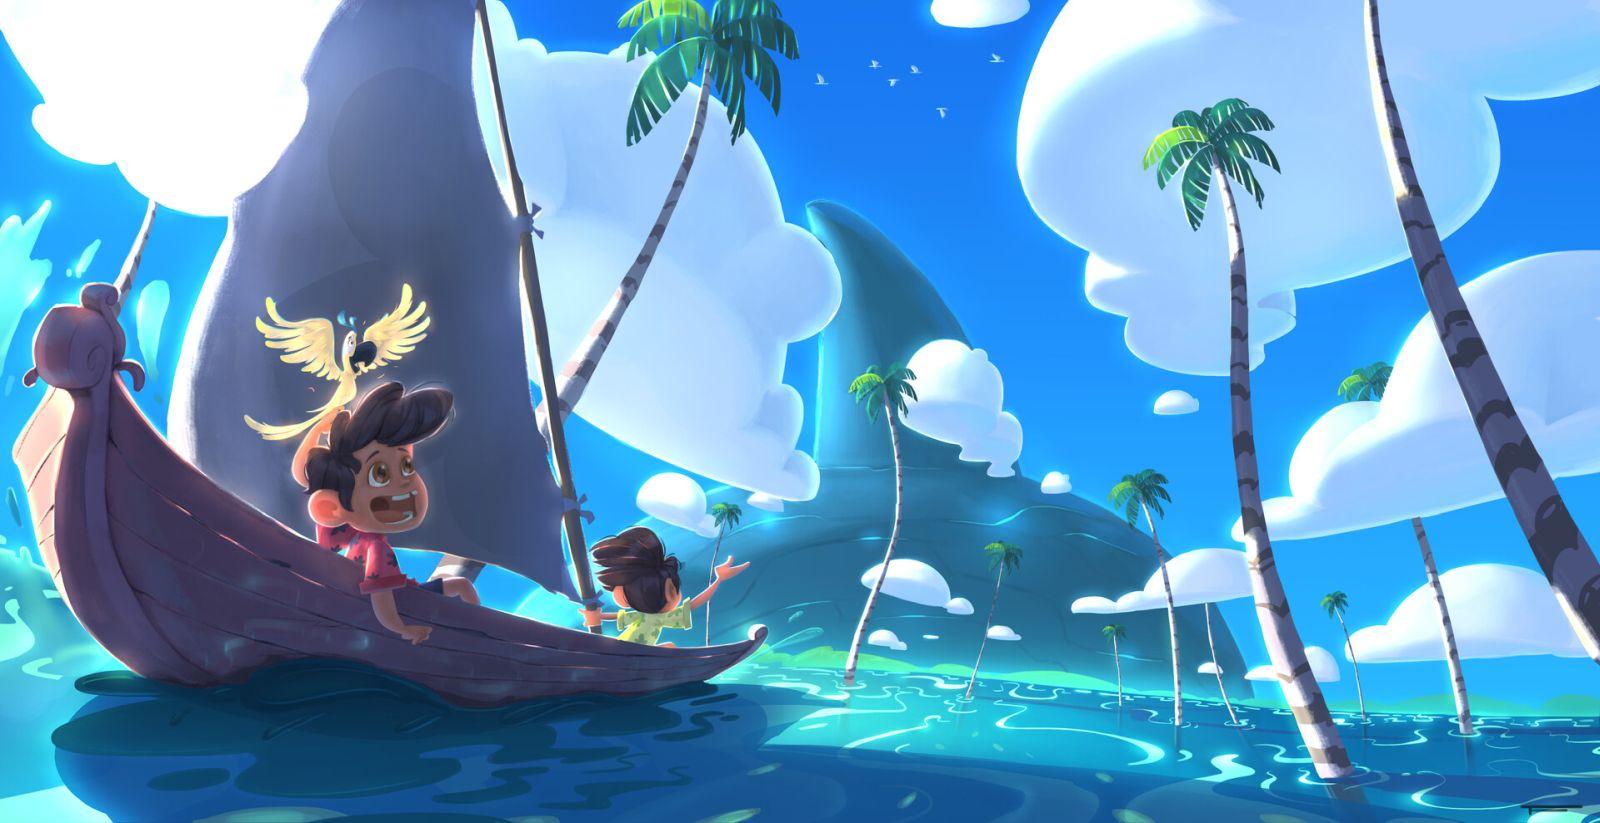 indian digital illustration sea travel